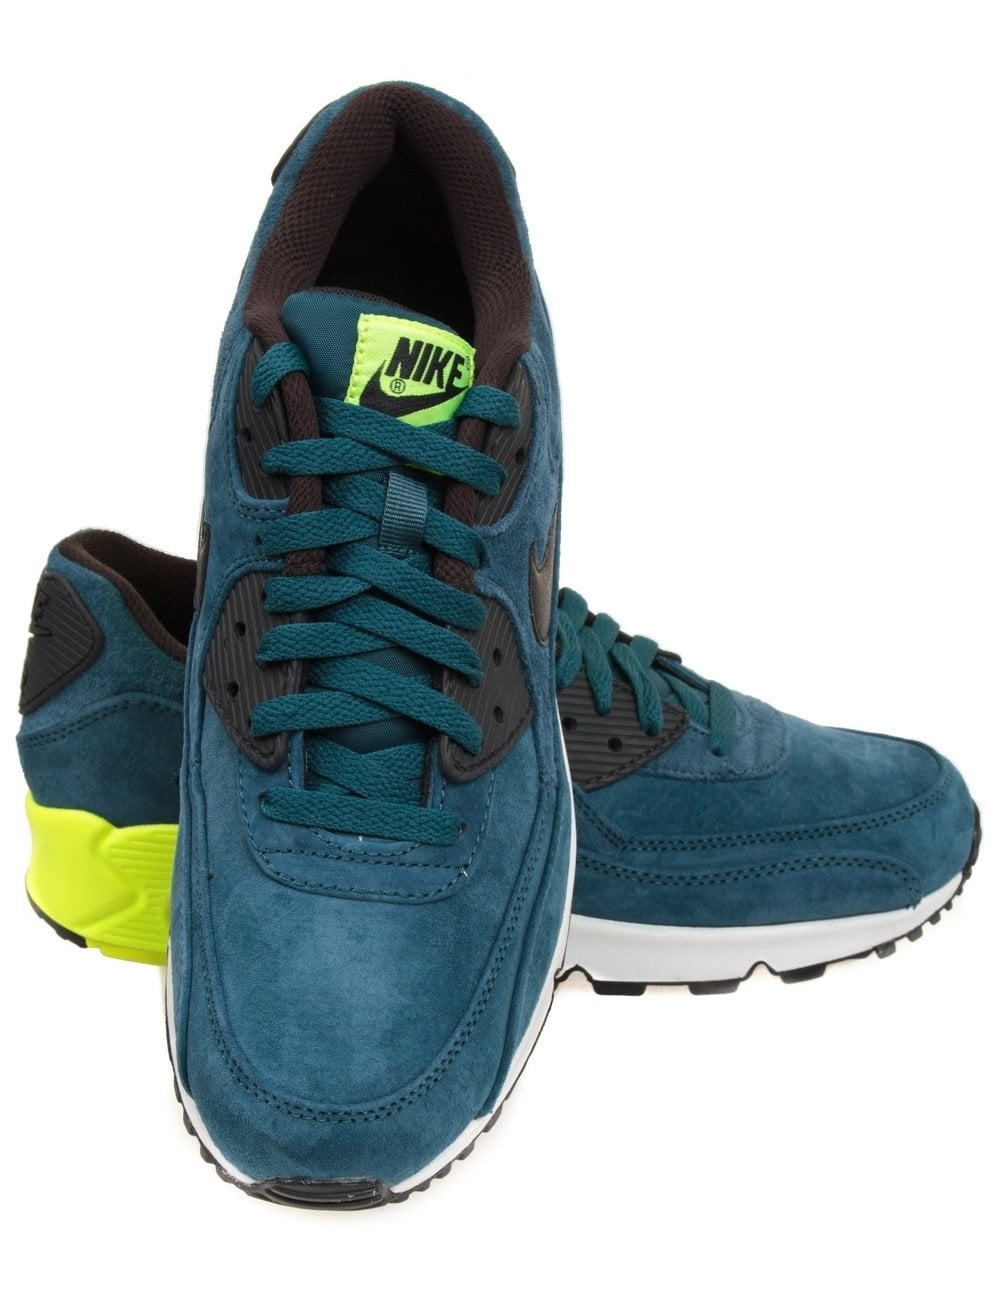 9dcd9c1e014 Nike Air Max 90 Premium - Night Factor Volt - Footwear from Fat ...